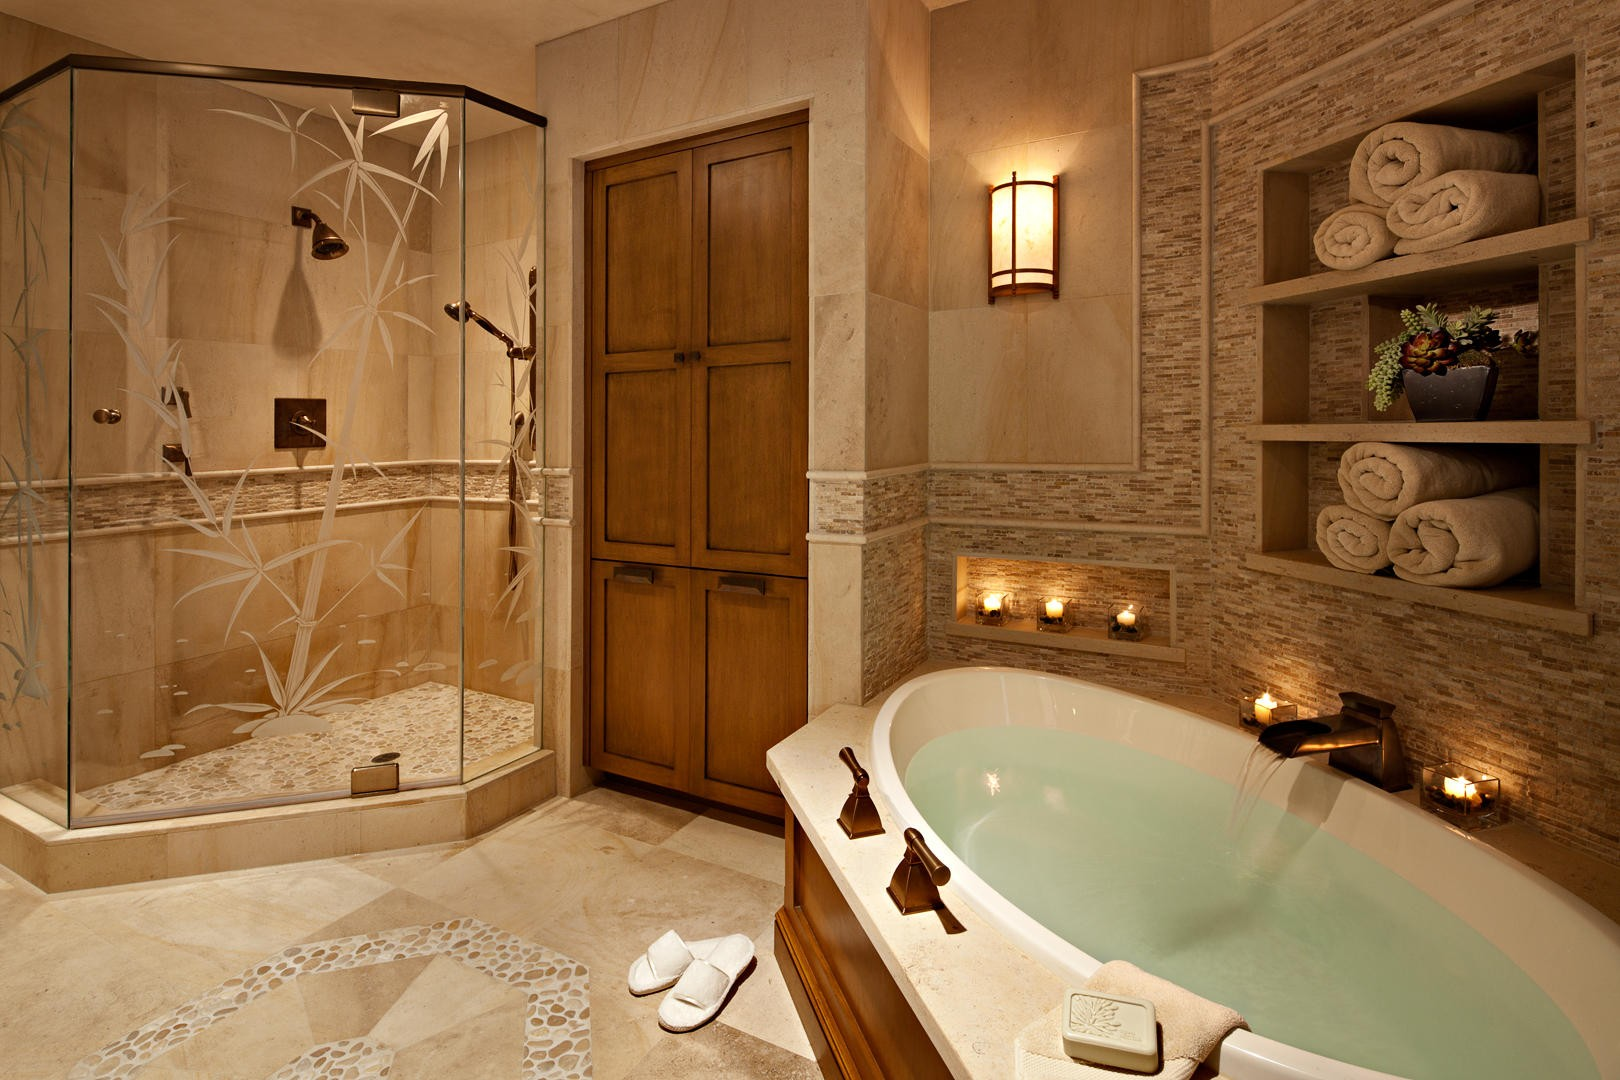 small spa bathroom design ideas photo - 10